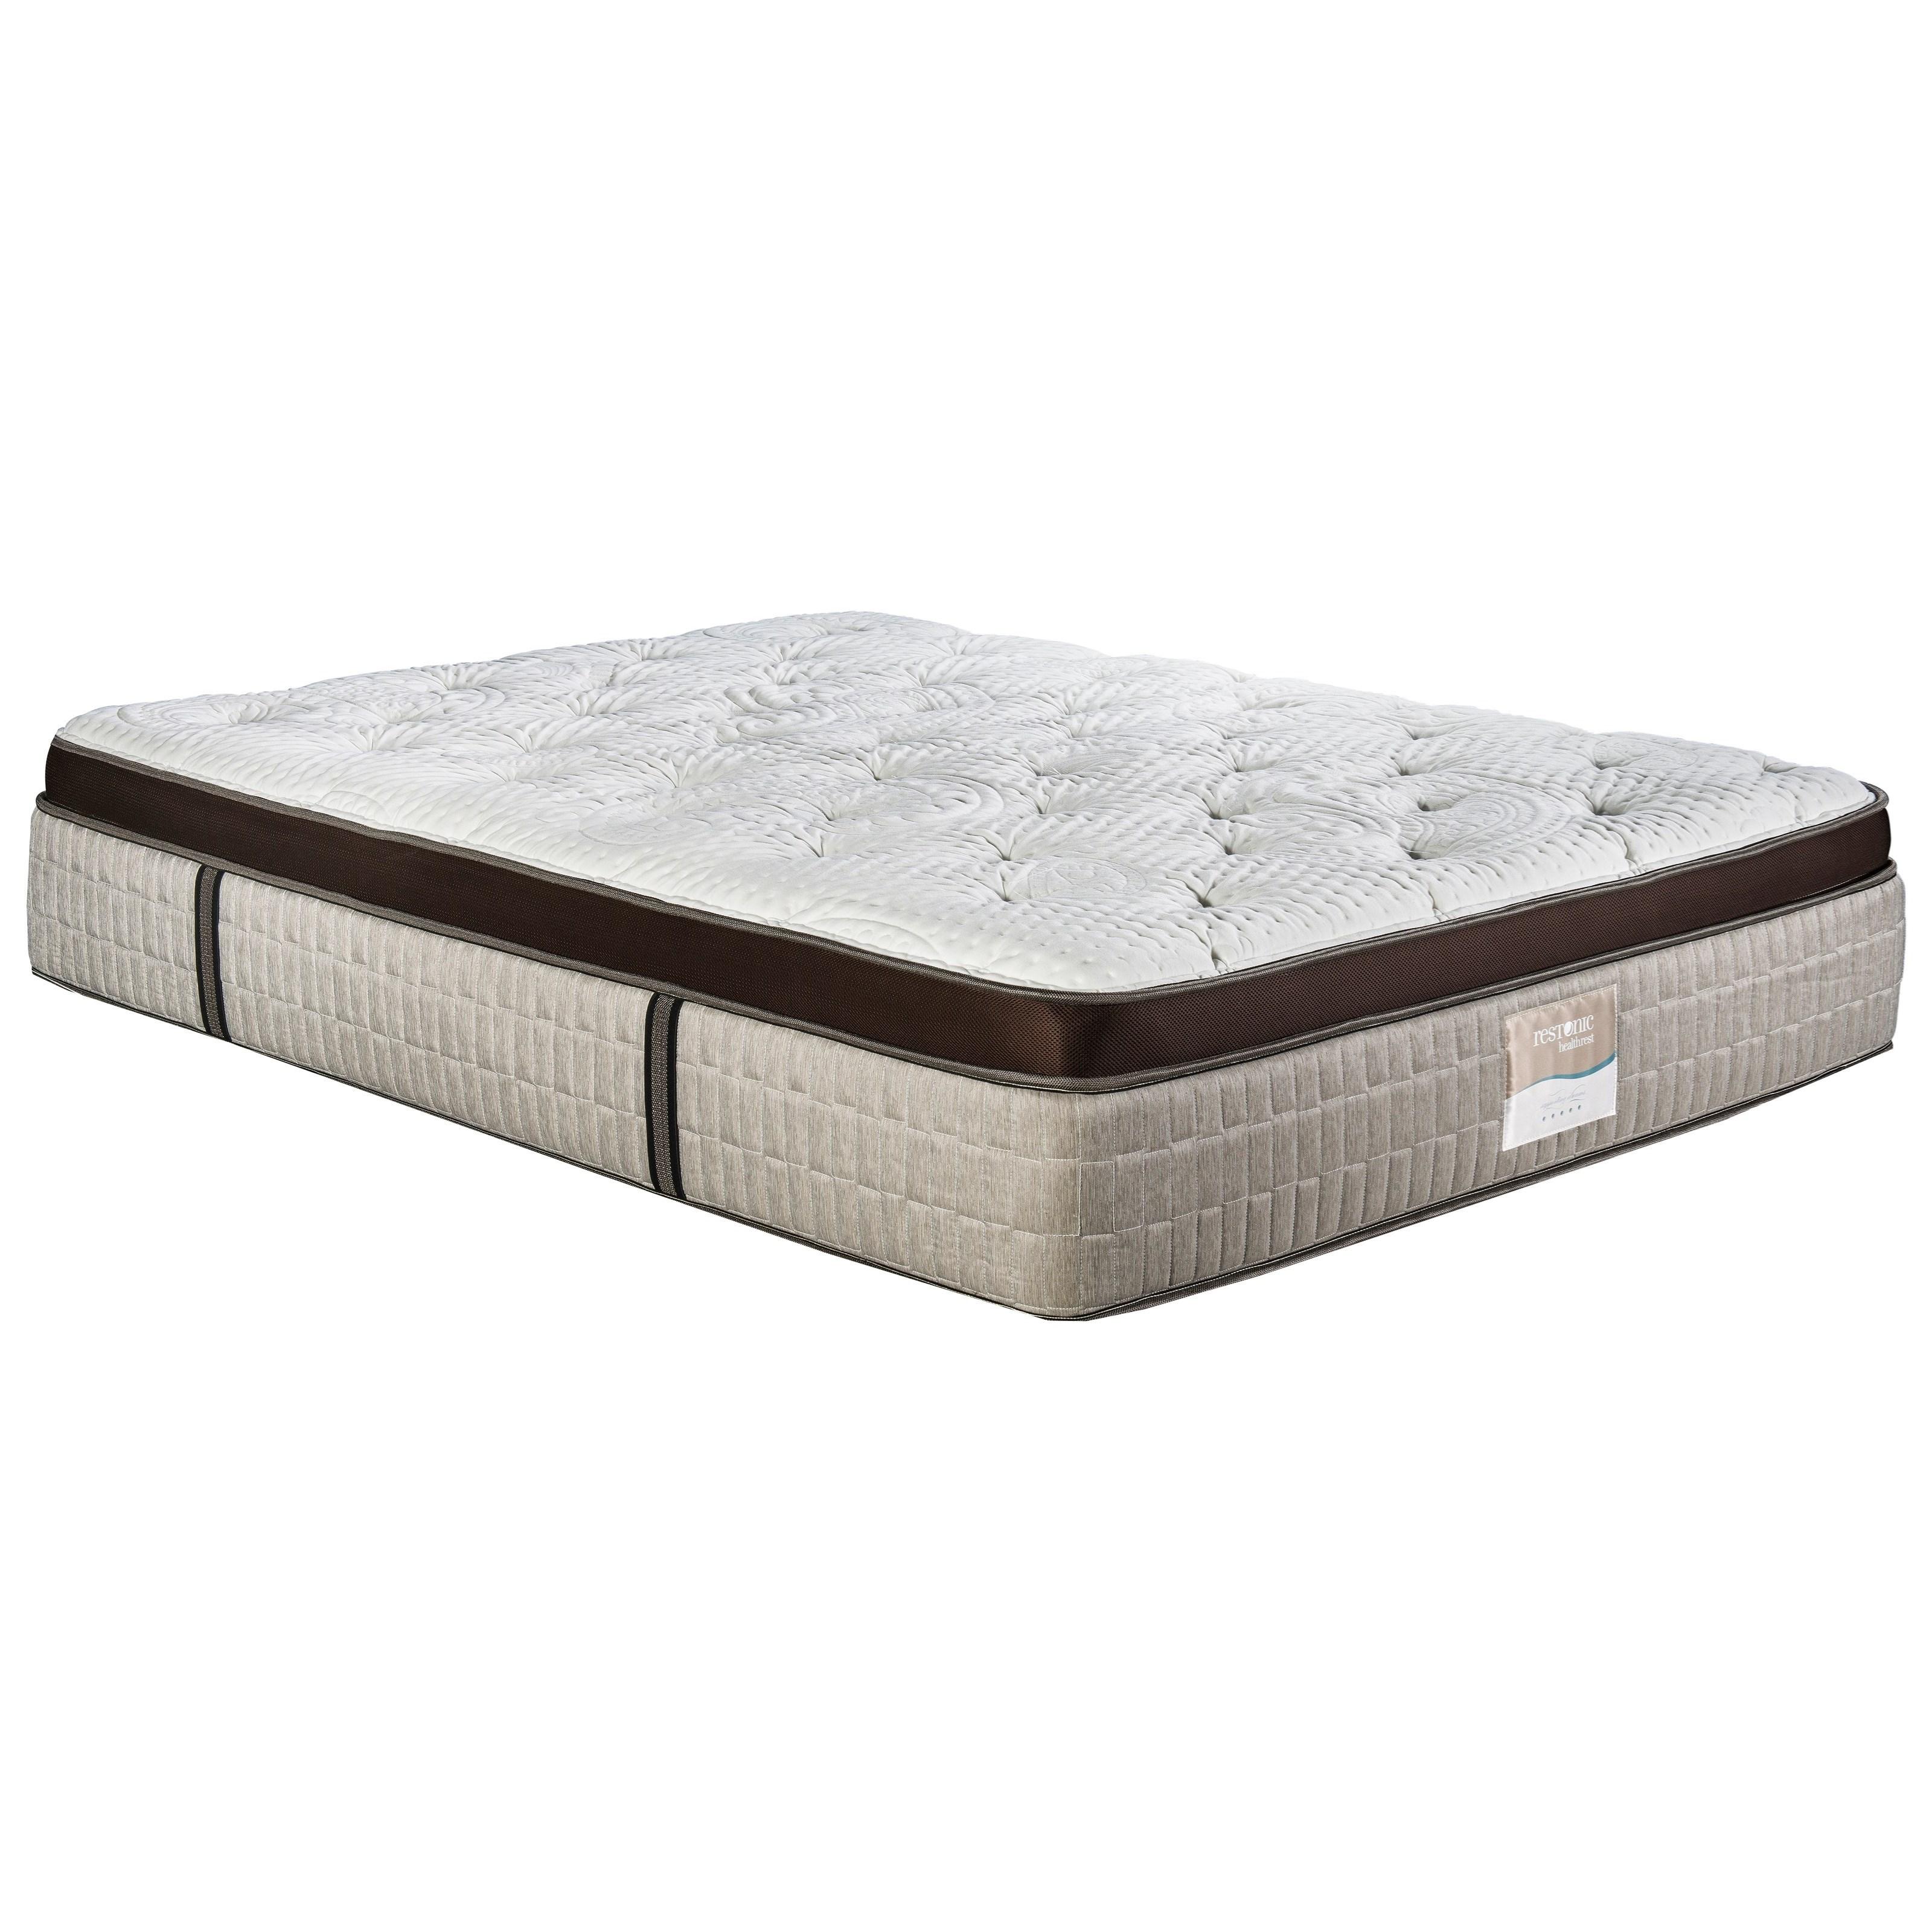 restonic latex vienna queen 15 euro top plush talalay latex mattress olinde 39 s furniture. Black Bedroom Furniture Sets. Home Design Ideas